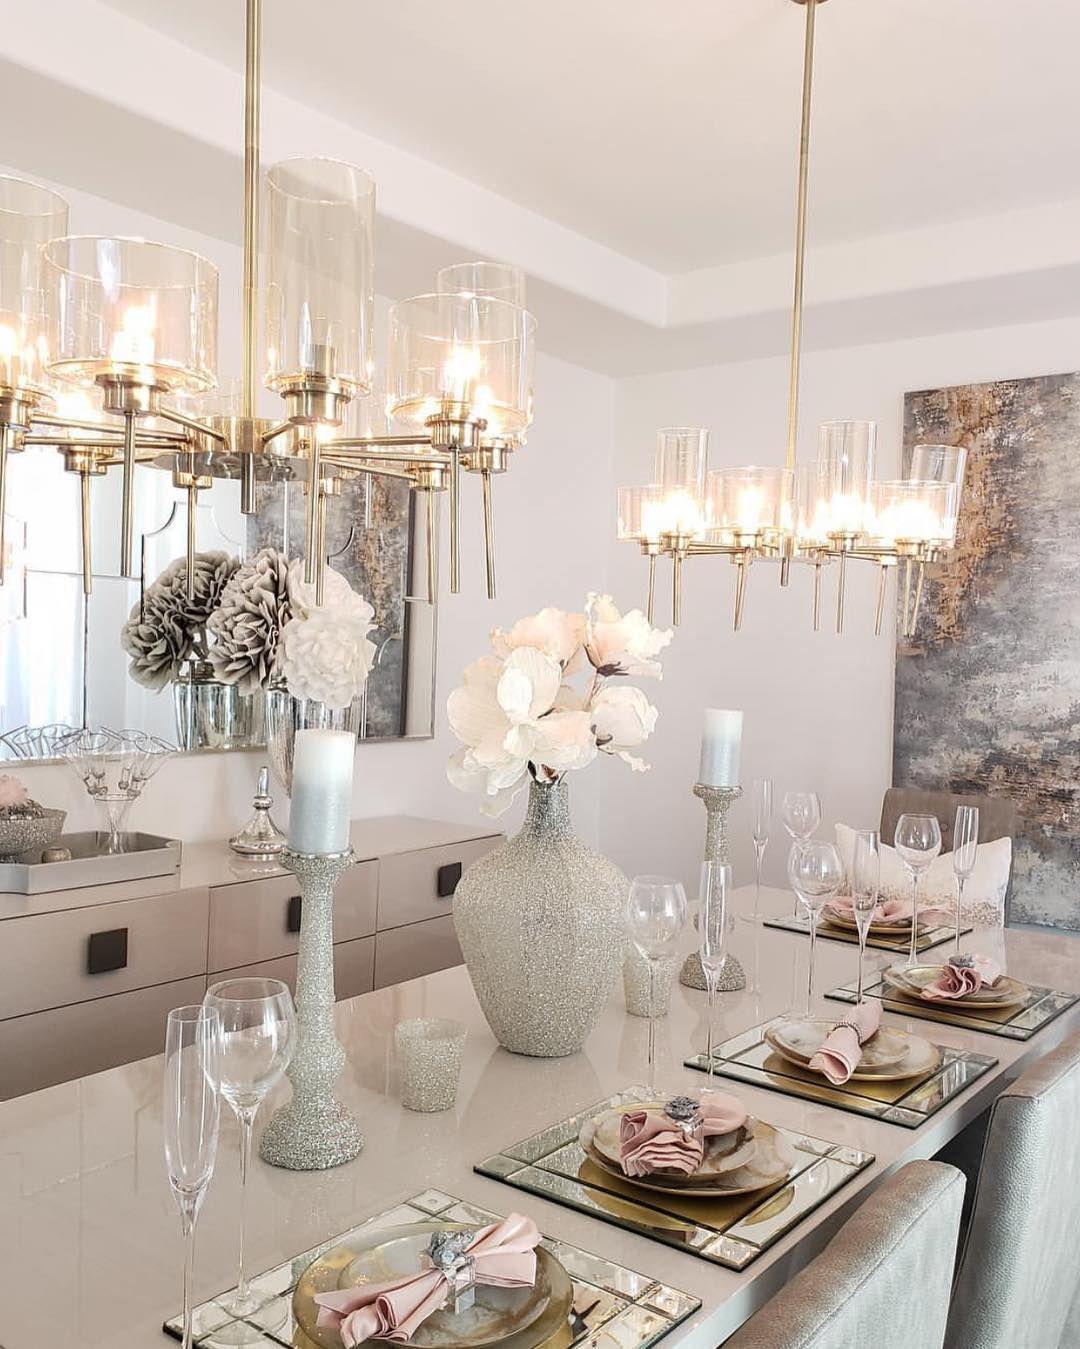 Best Home Decor Online Store Home decor online, Home